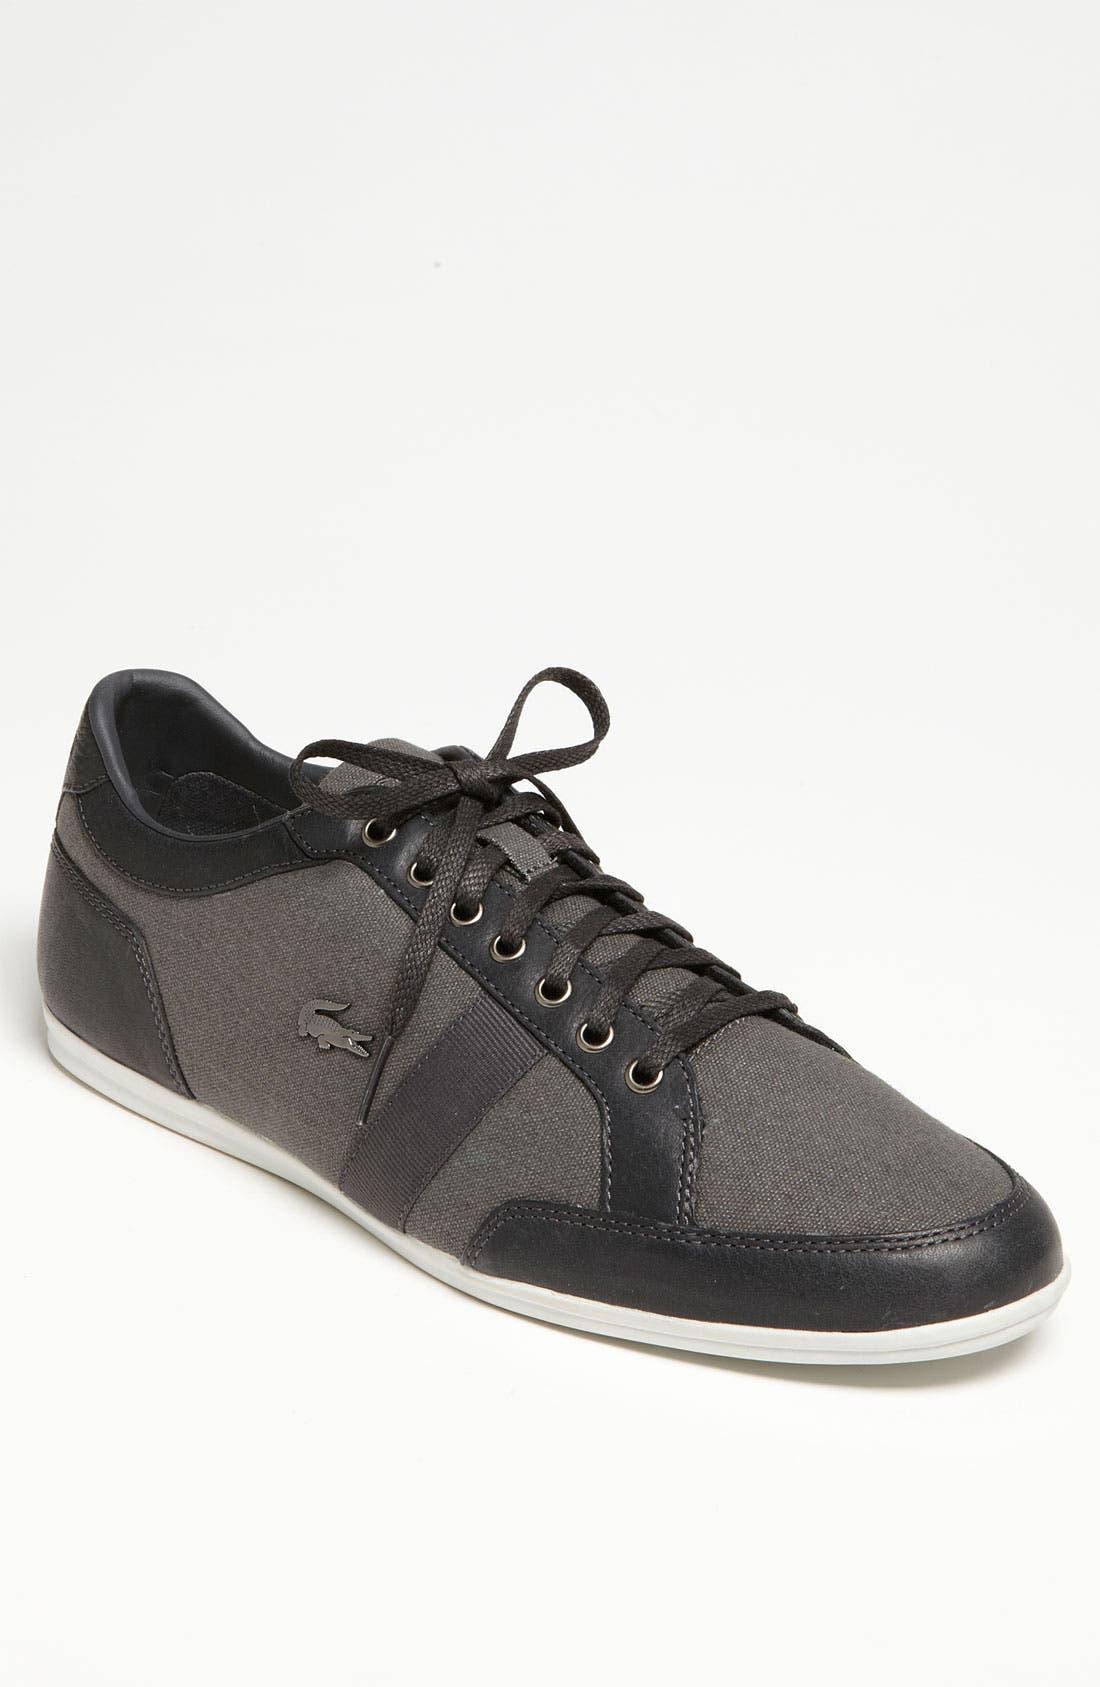 Main Image - Lacoste 'Alisos 5' Sneaker